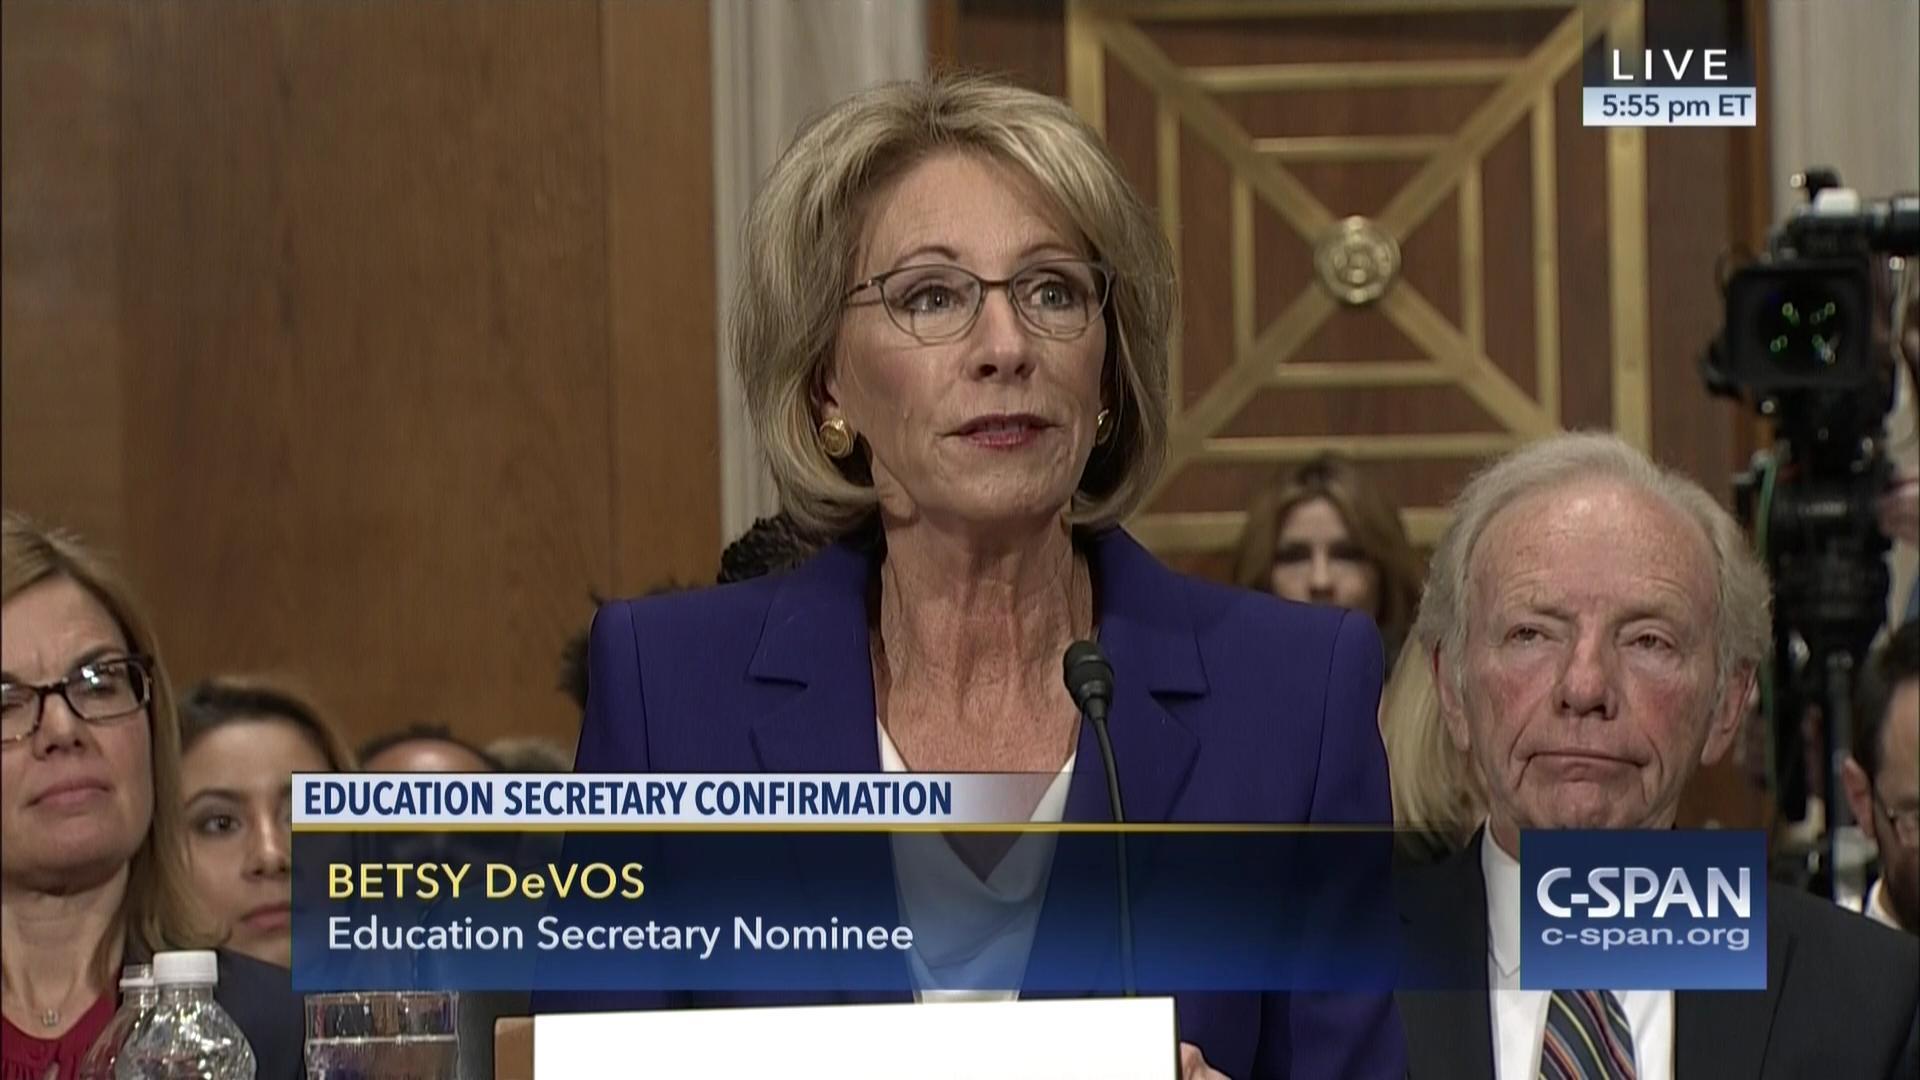 Education secretary nominee betsy devos testifies confirmation hearing